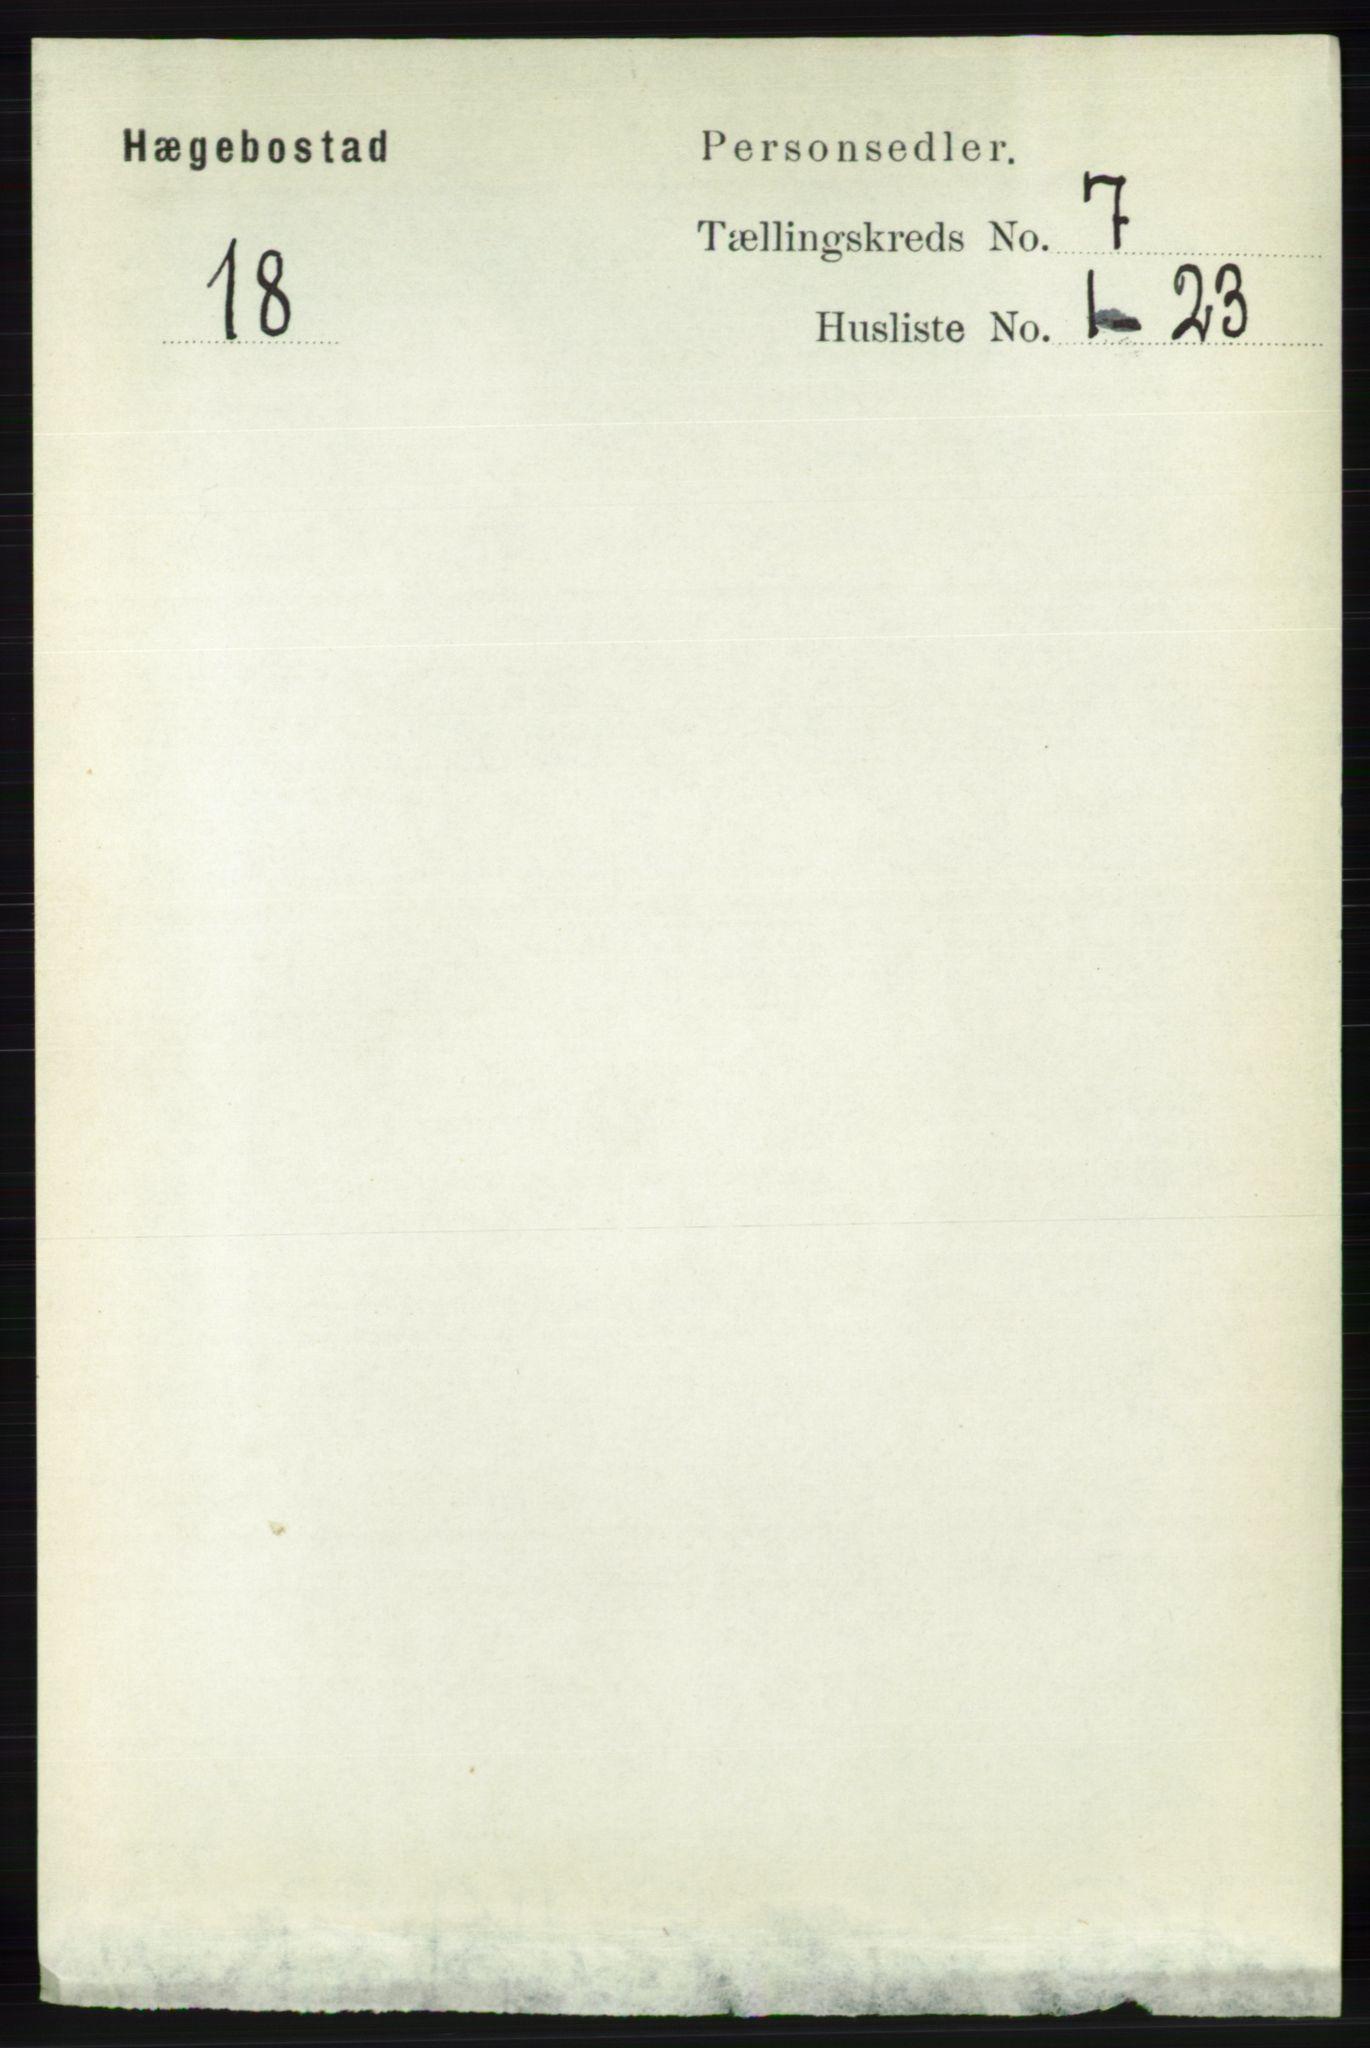 RA, Folketelling 1891 for 1034 Hægebostad herred, 1891, s. 2100